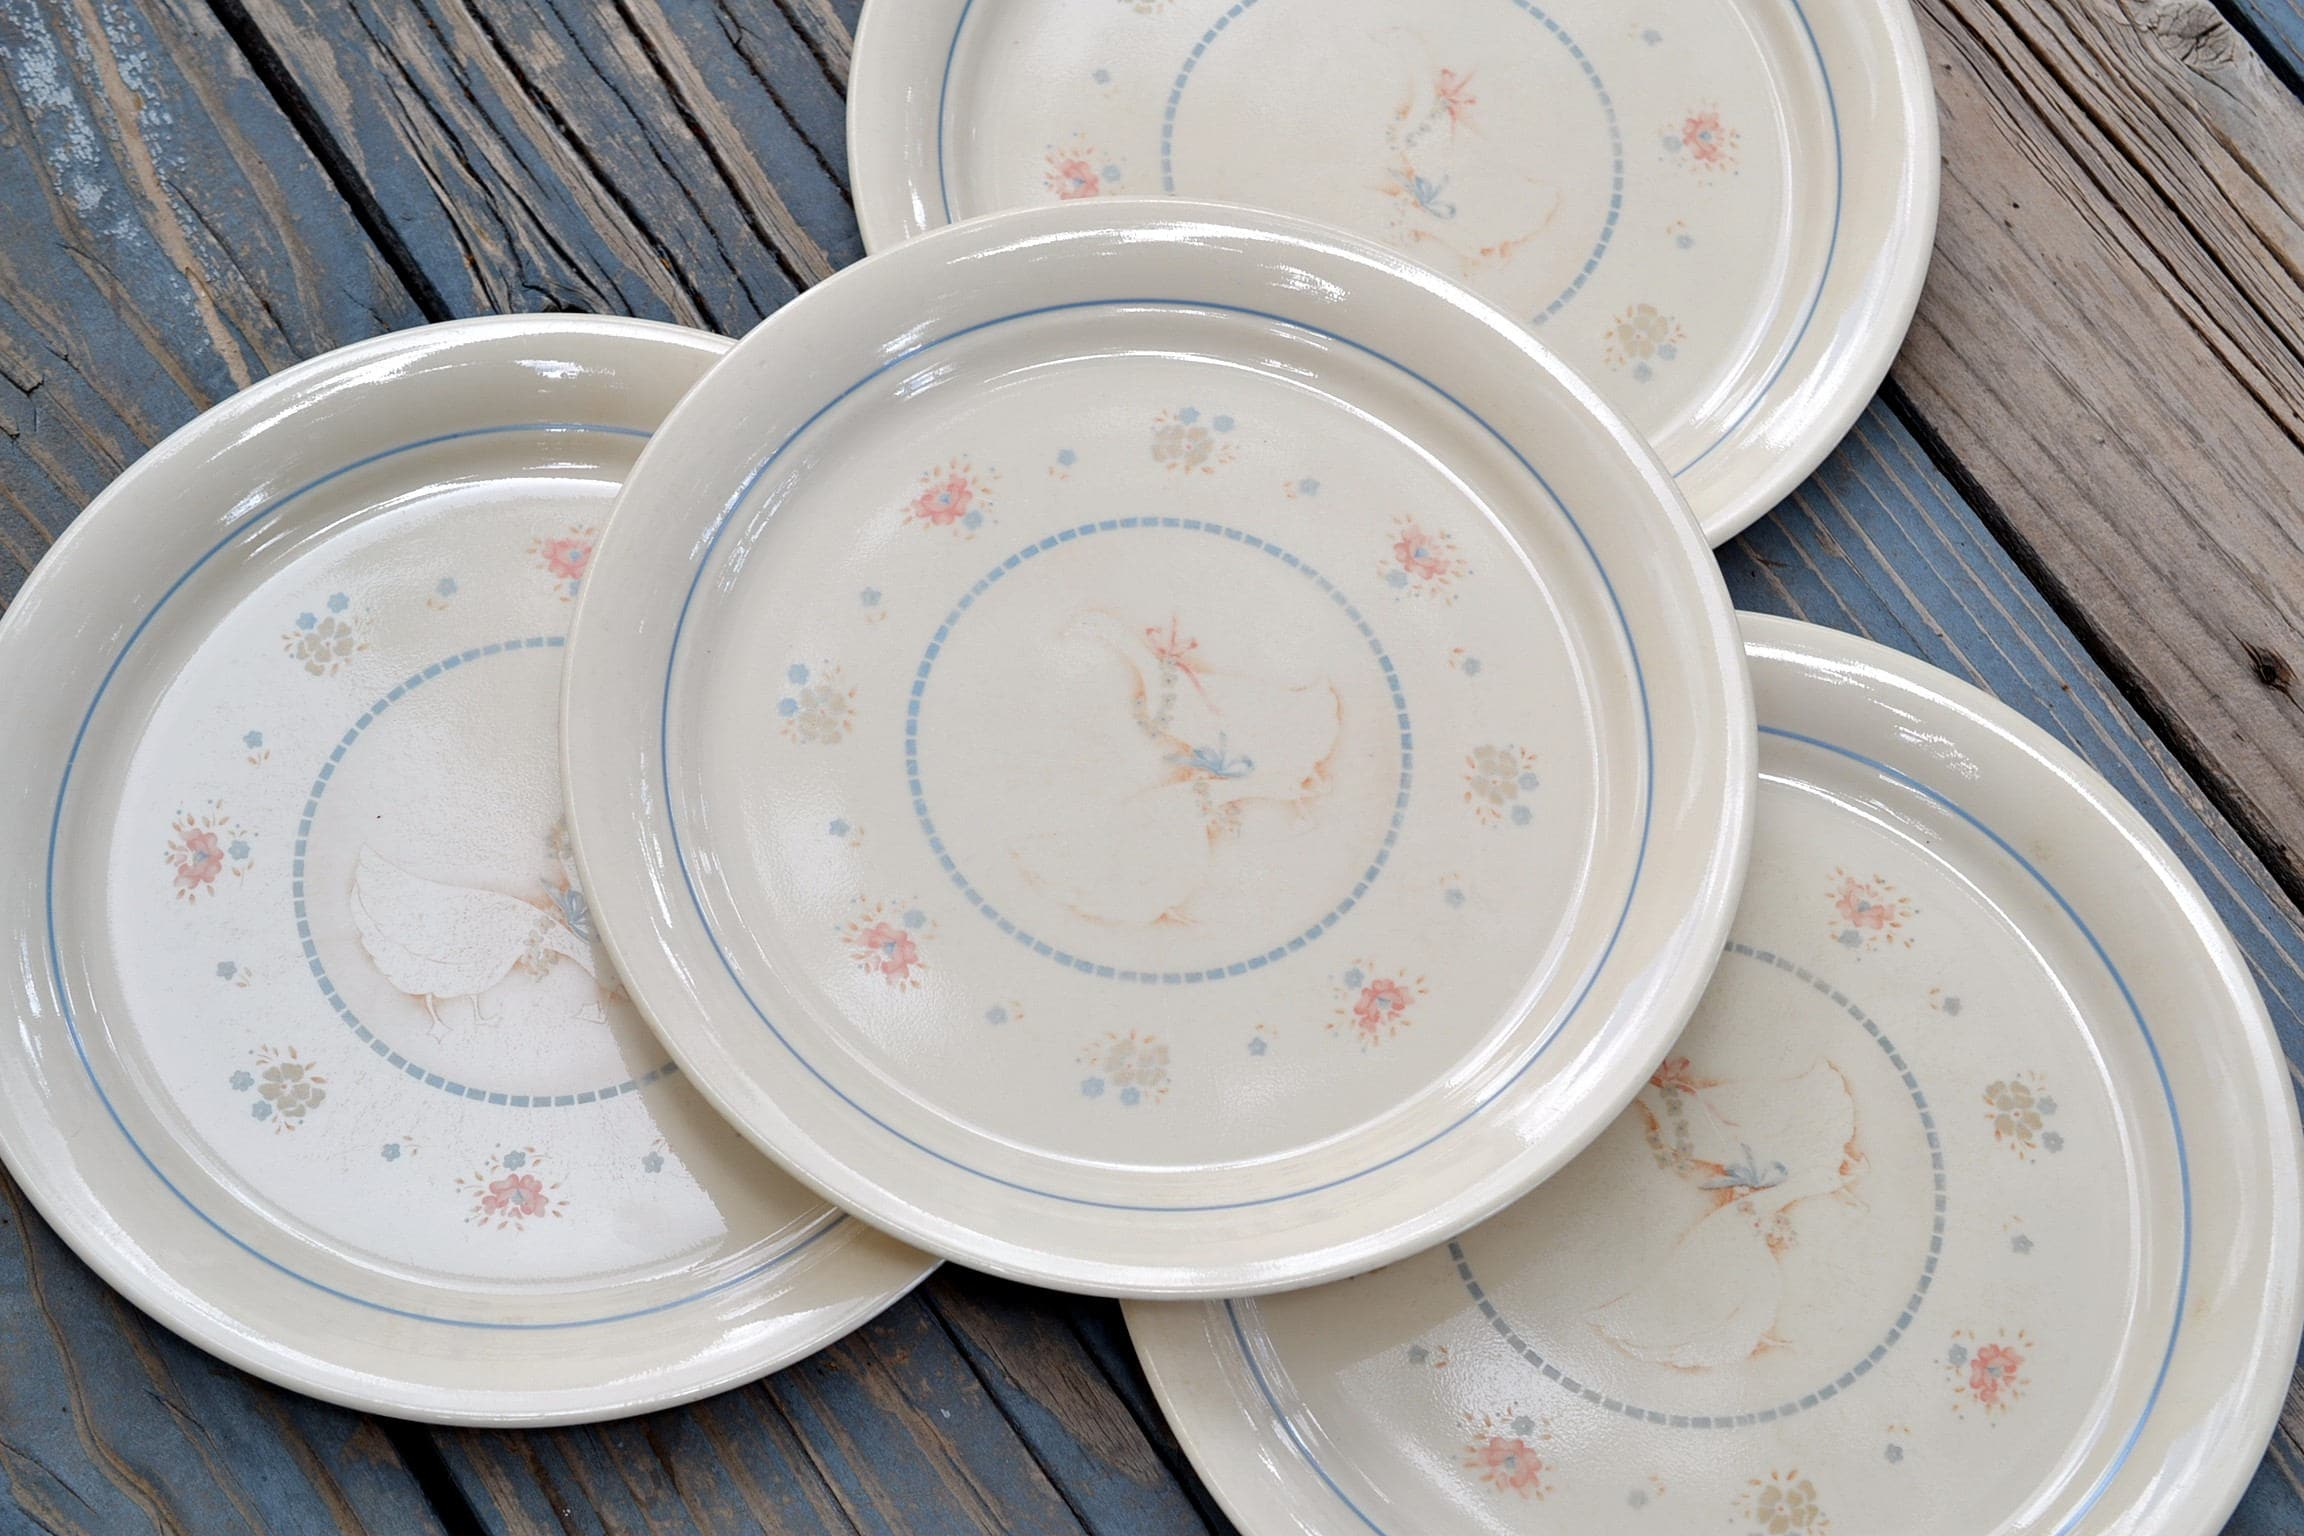 livingware service country cottages com cottage amazon corelle for dinnerware dp set dishes sets piece